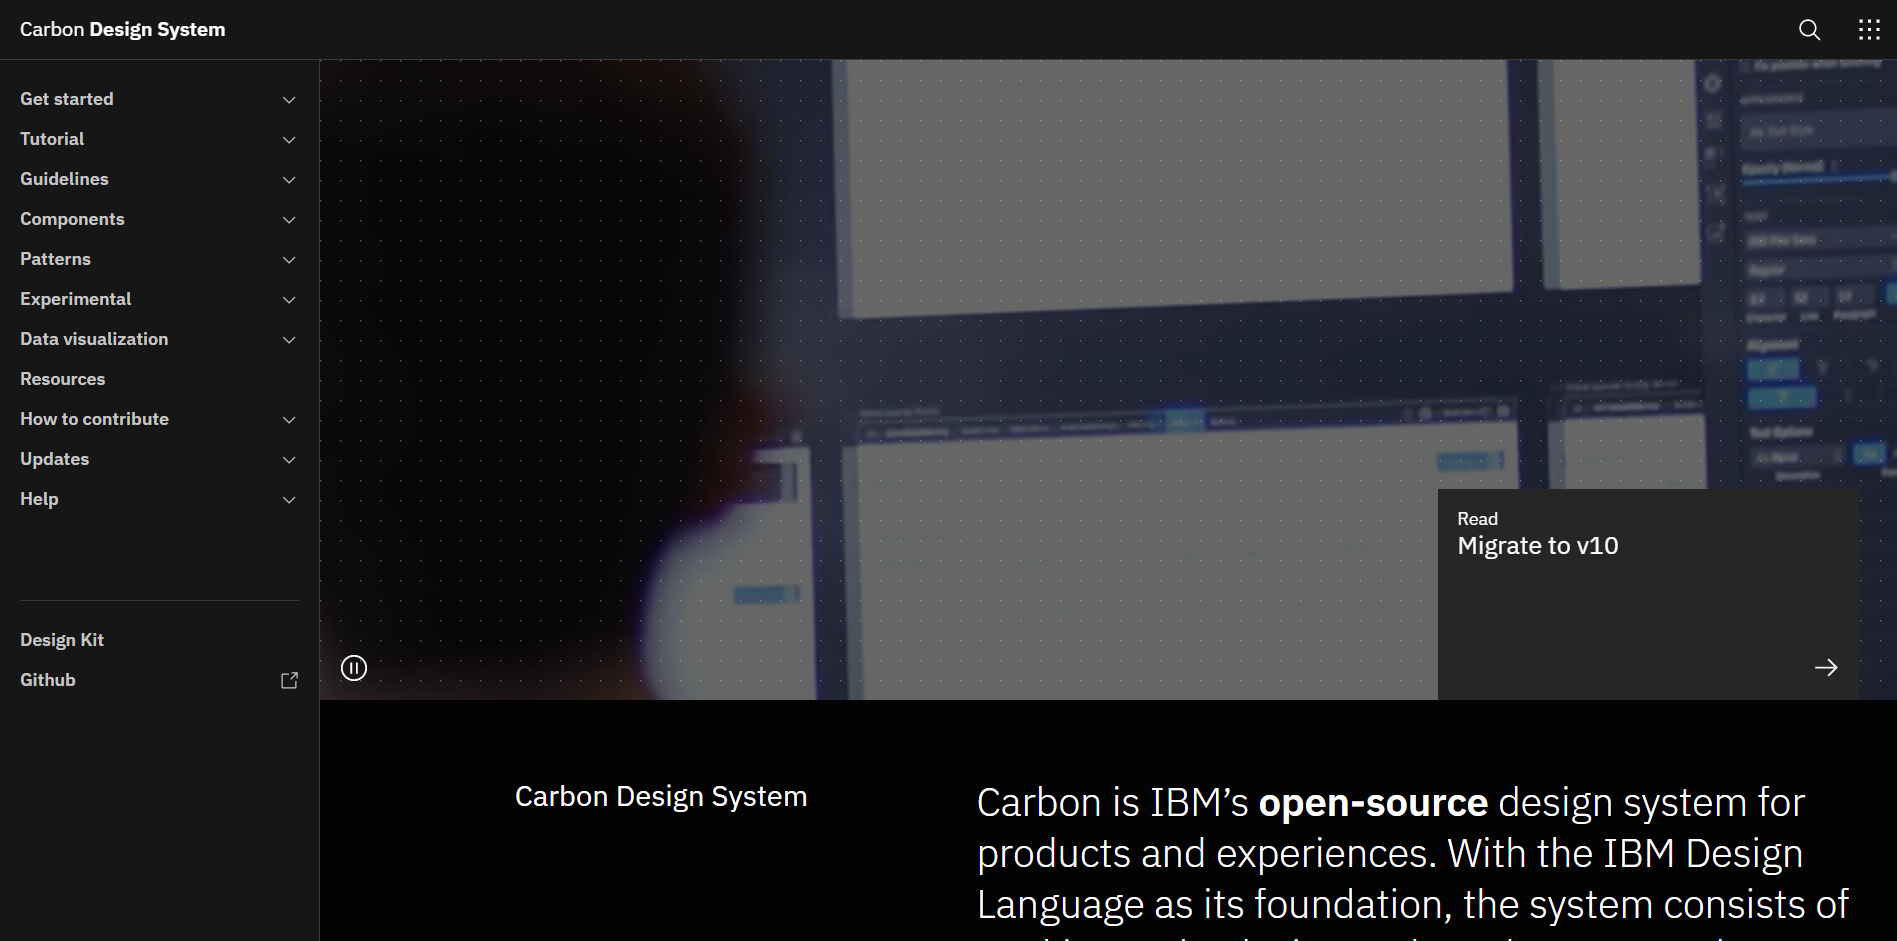 Carbon Design System landing page